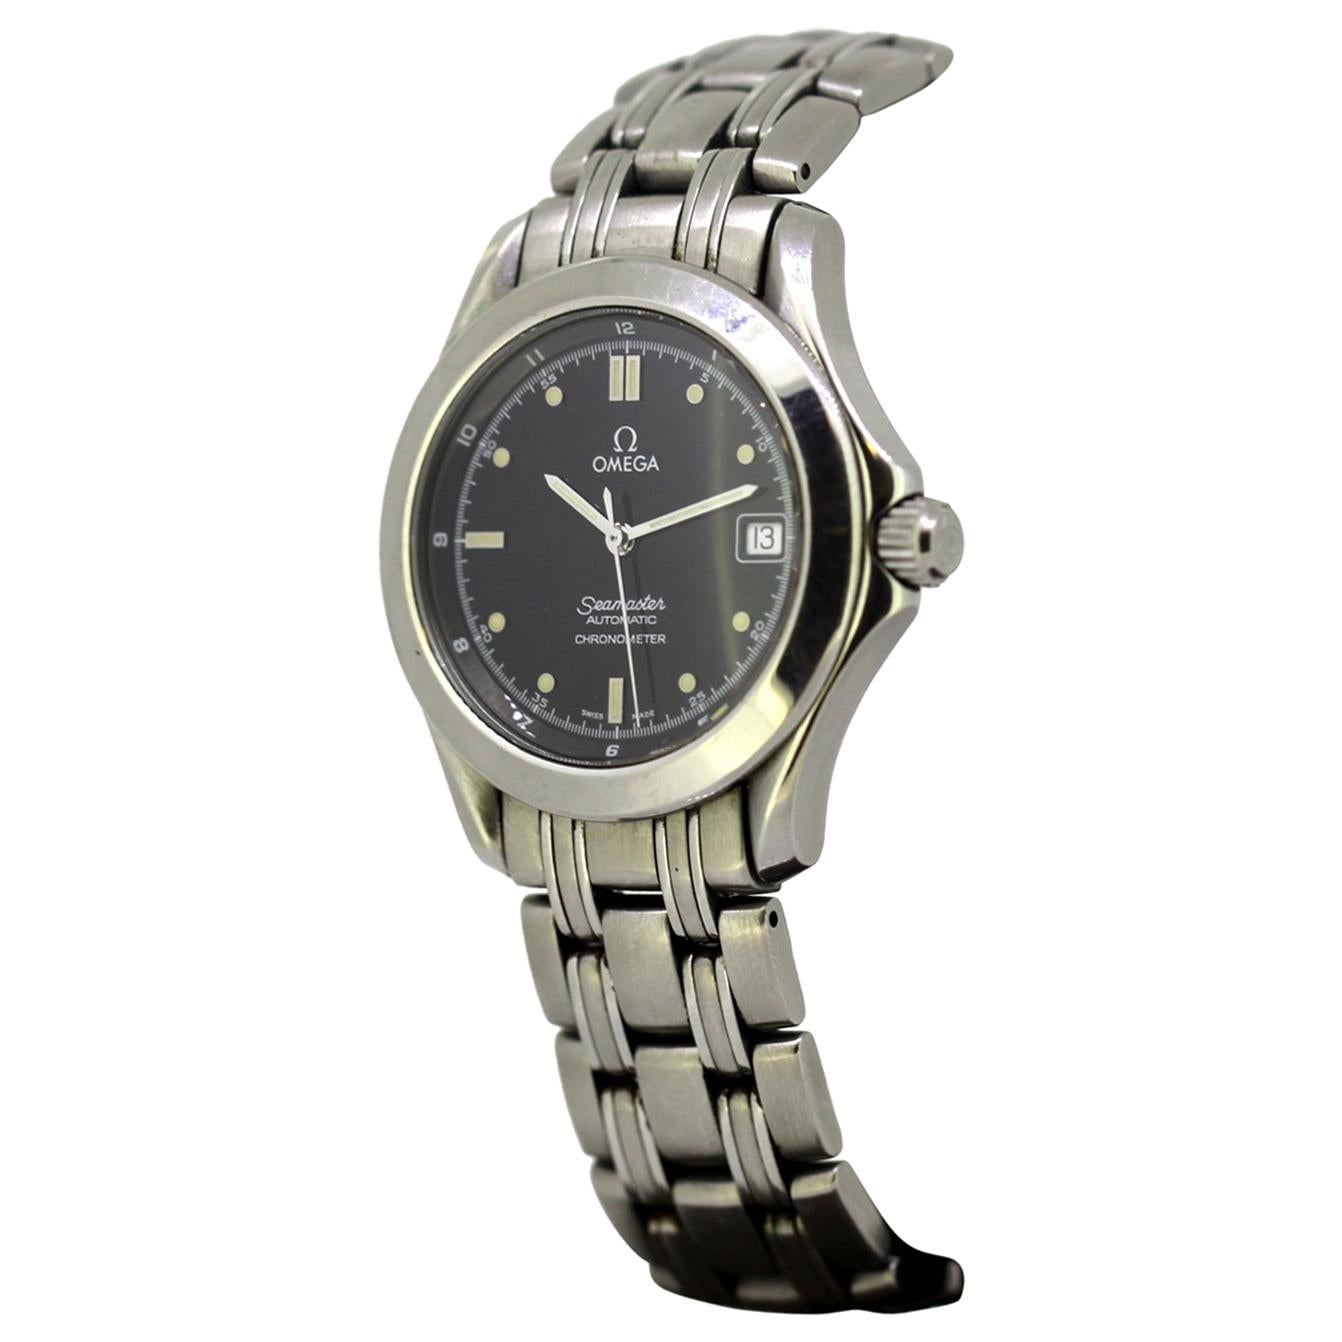 Omega Seamaster, Automatic Chronometer Men's Wristwatch, circa 1990s